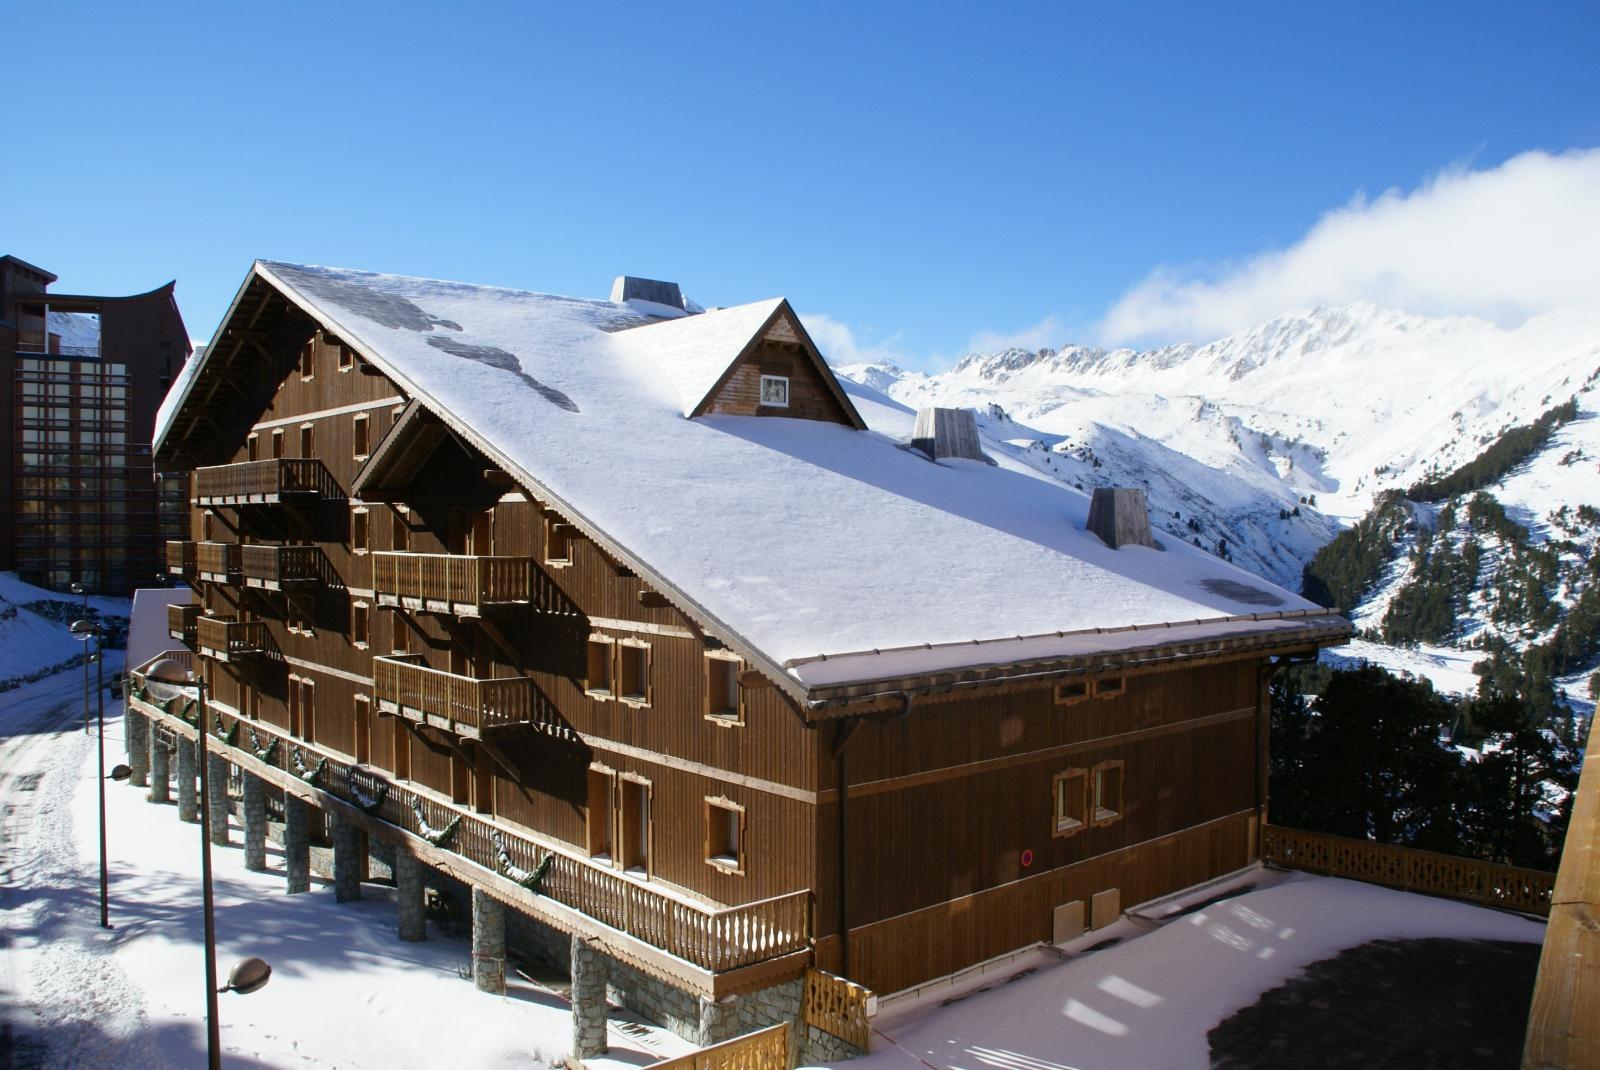 Chalet Altitude in Les Arcs